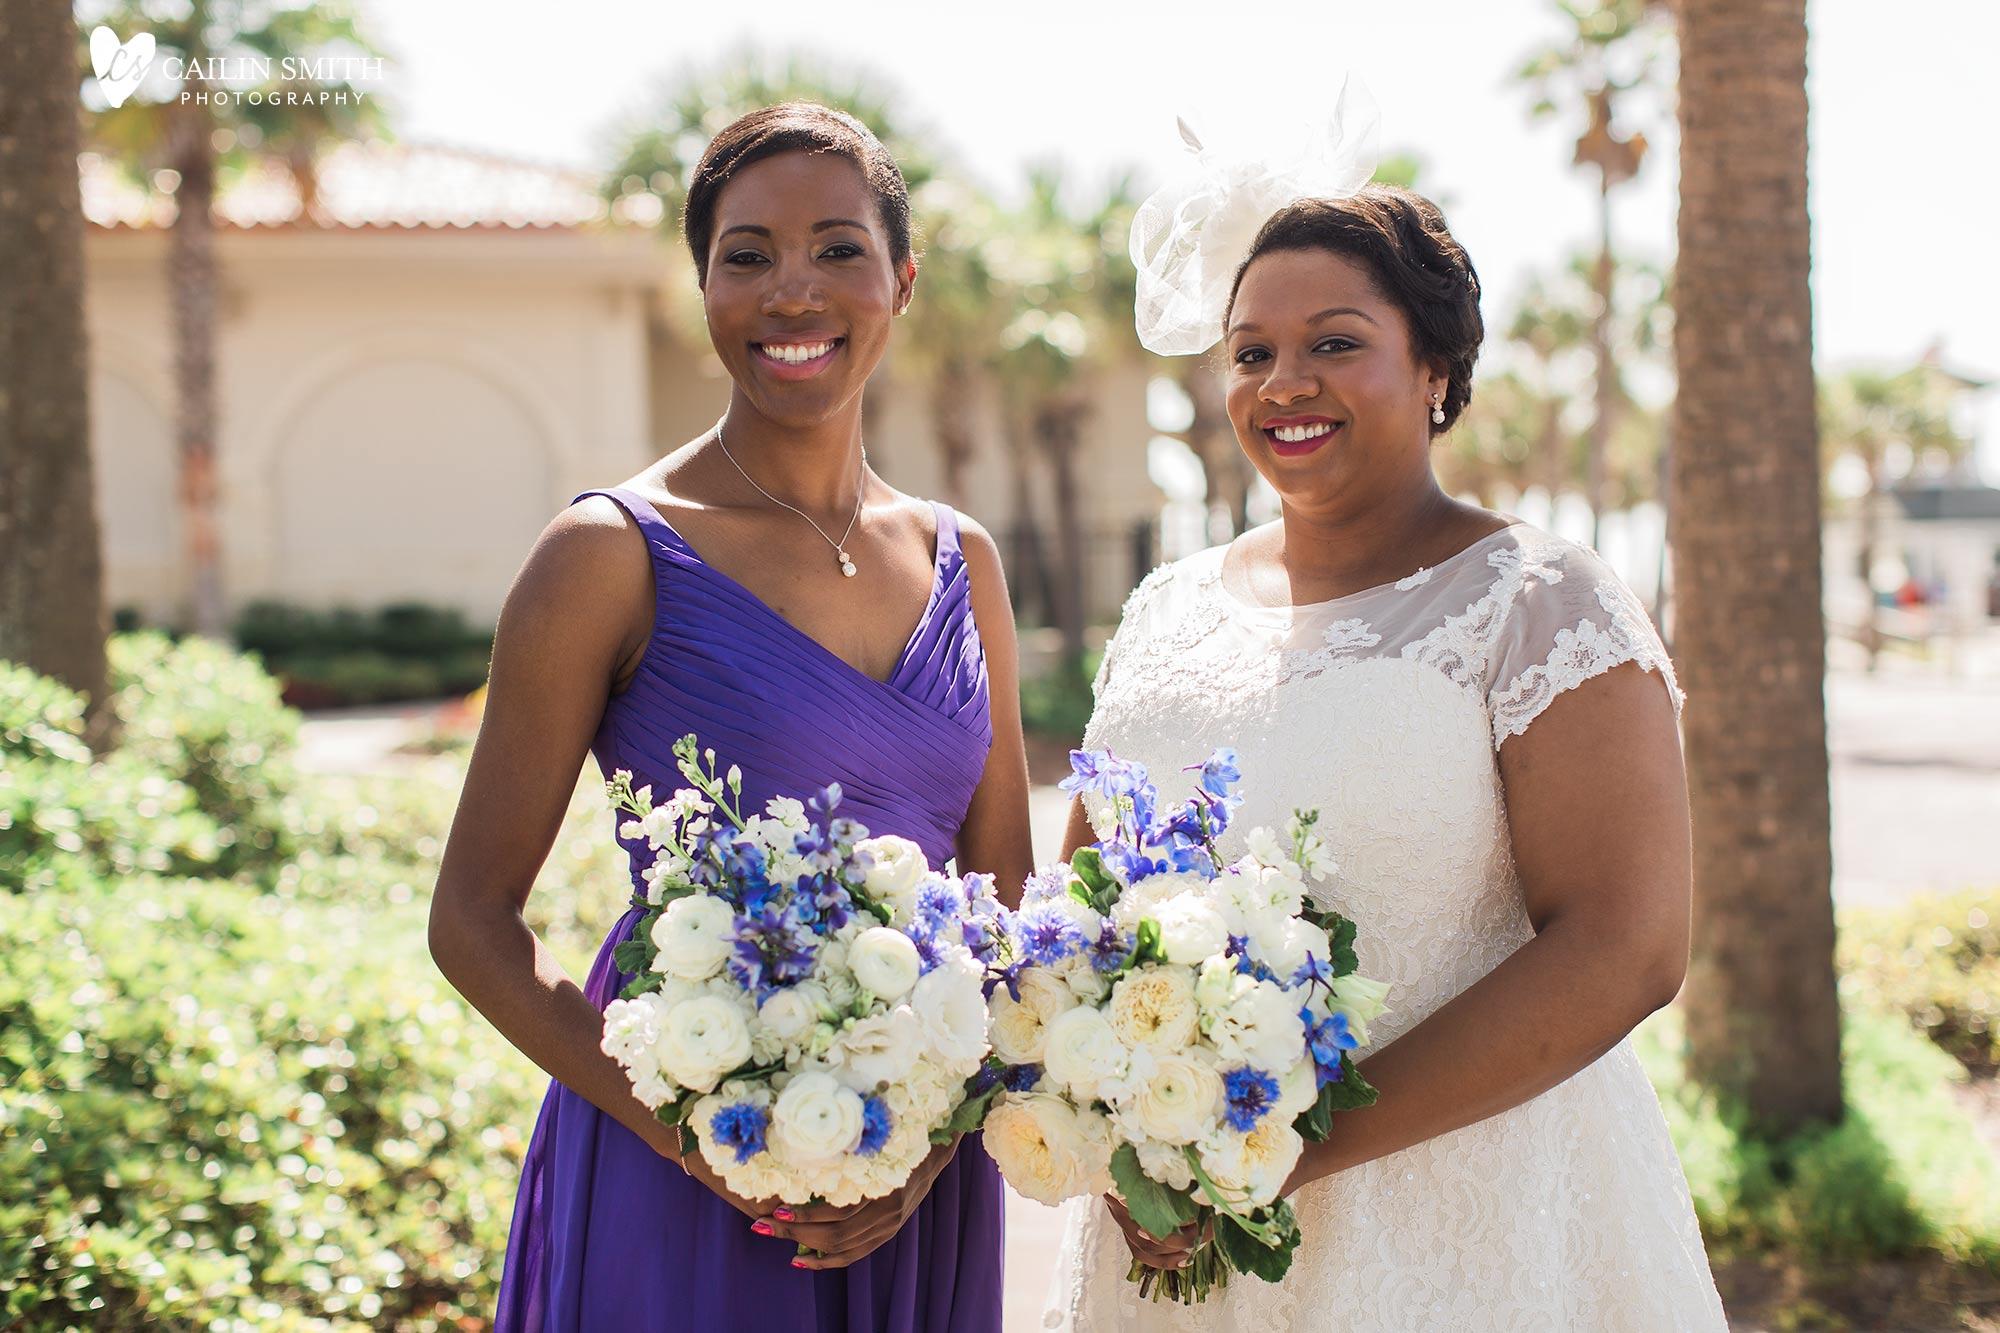 Danielle_Dave_One_Ocean_Wedding_Photography_Blog_039-2.jpg